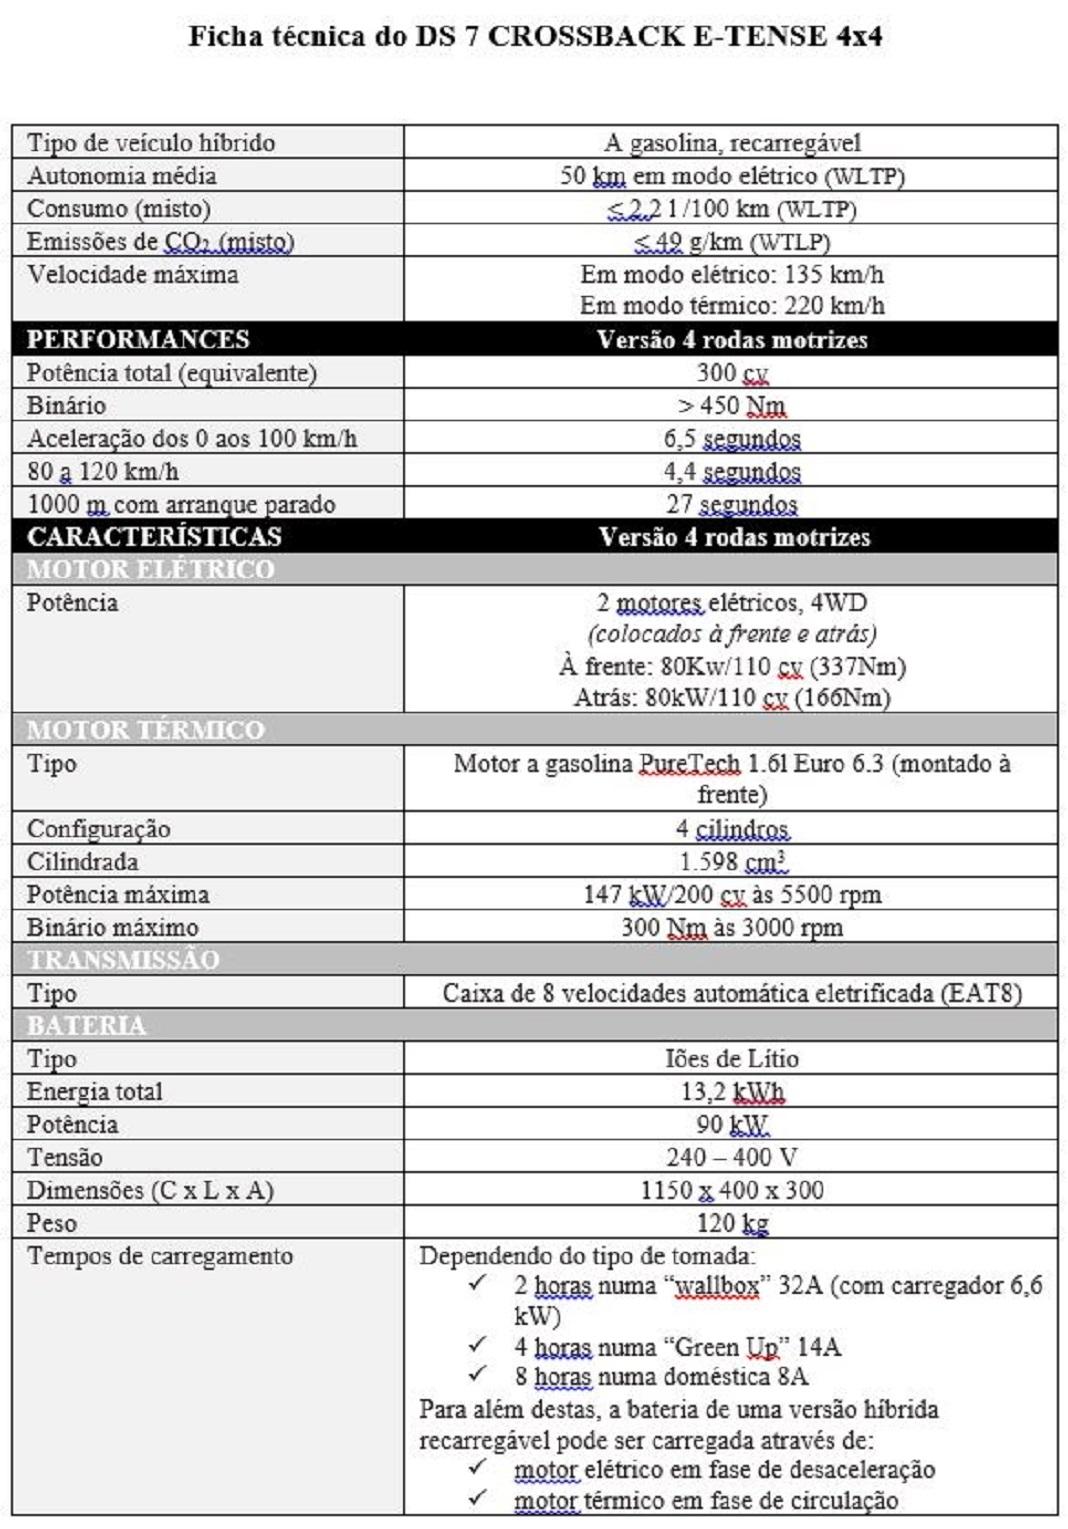 DS 7 CROSSBACK E-TENSE 4x4 - híbrido